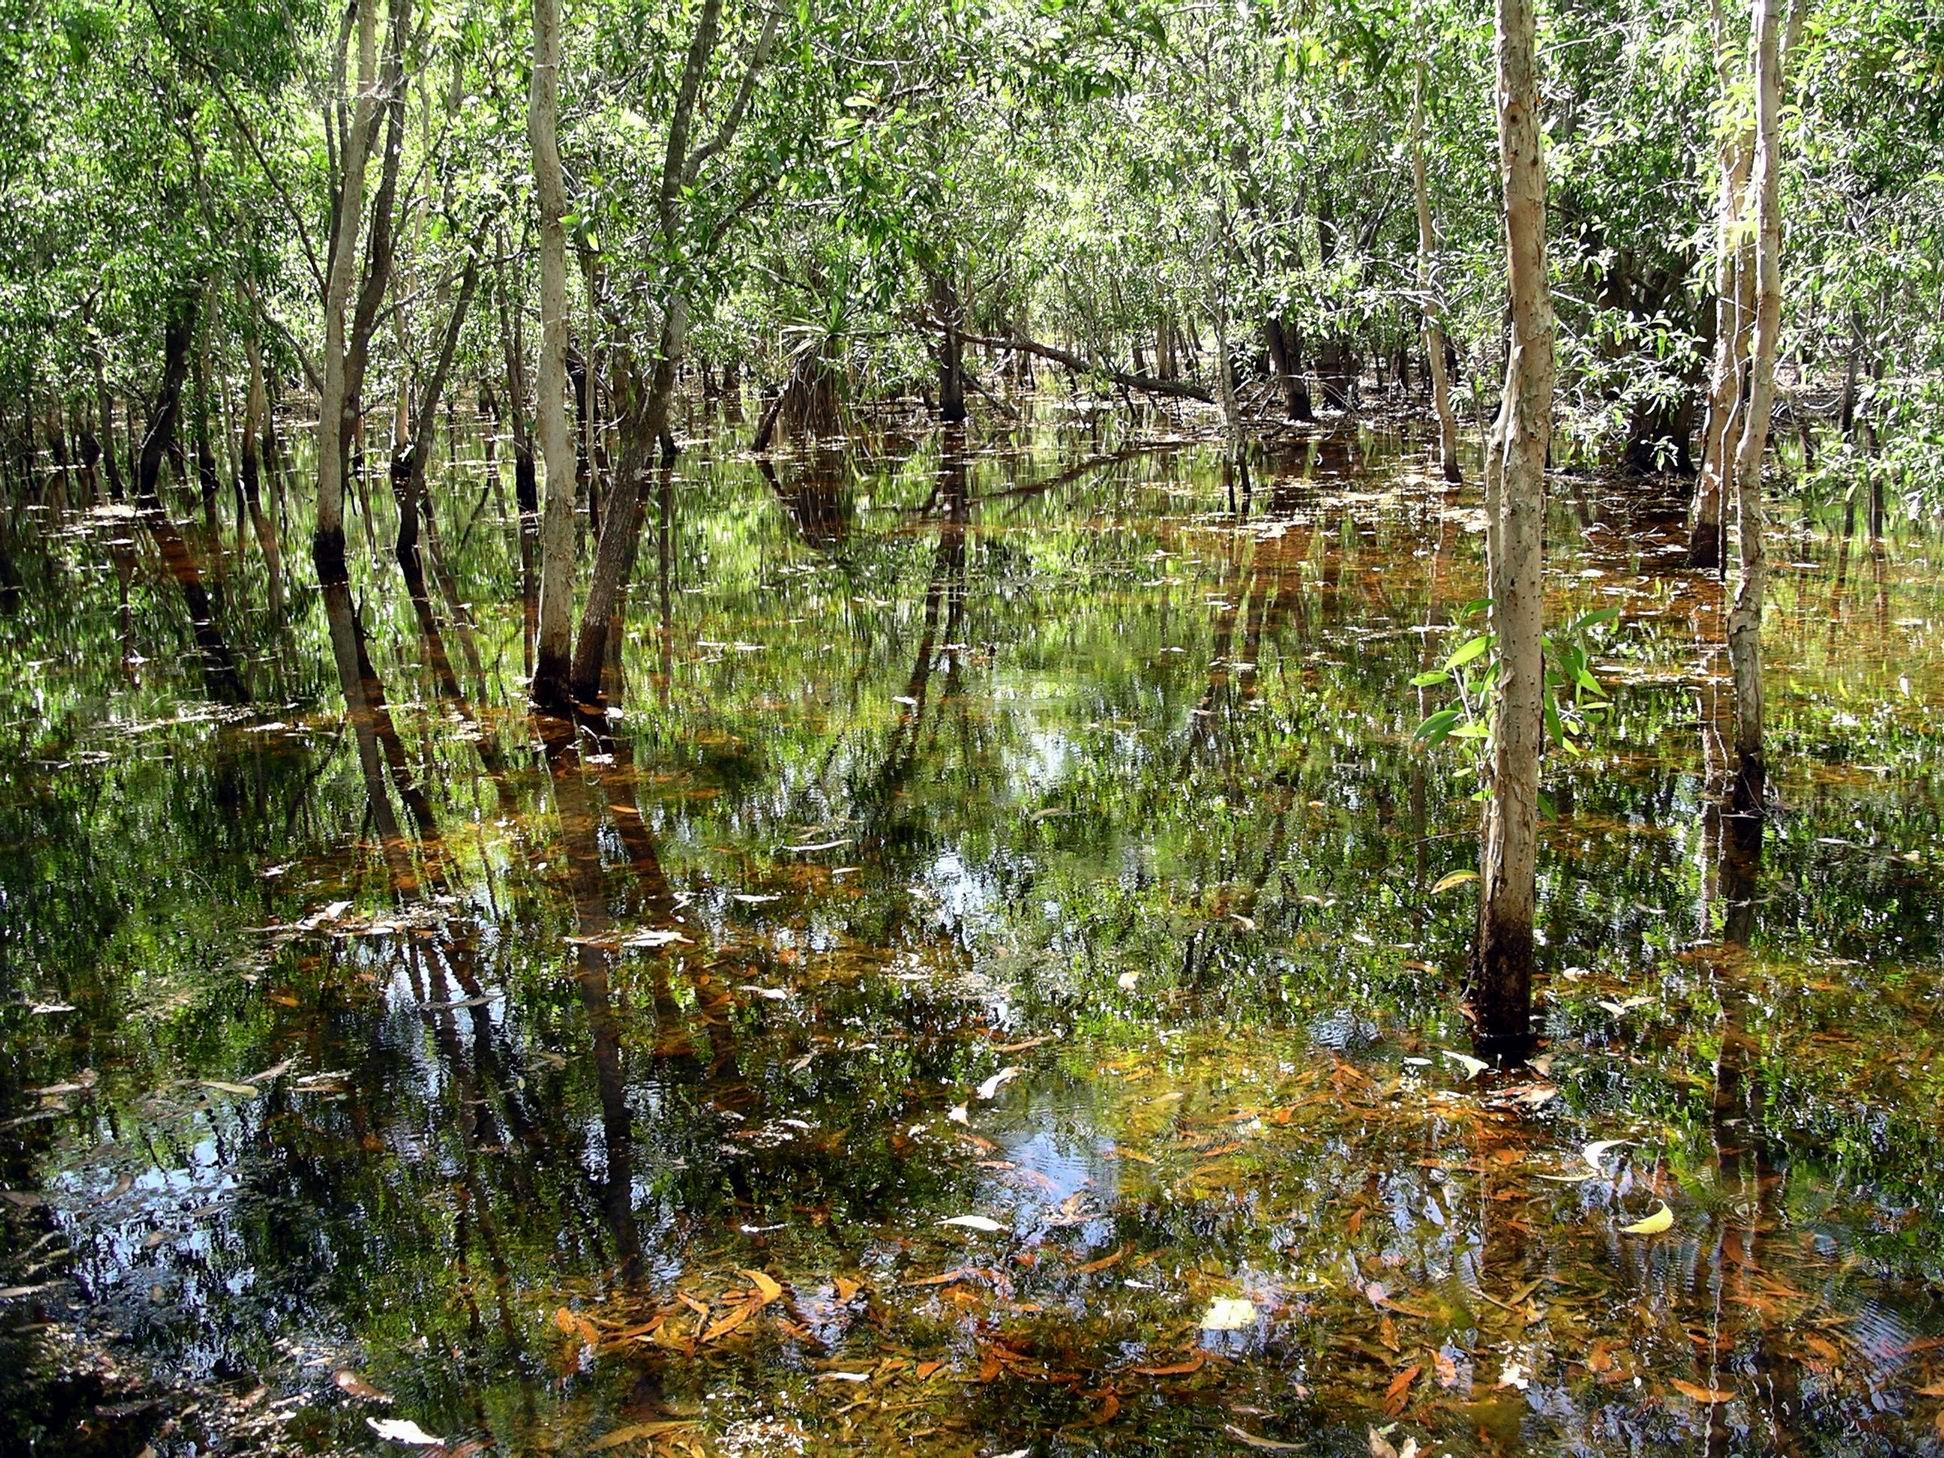 Resize of 05-31-2006 12 Lagoon study TW Park